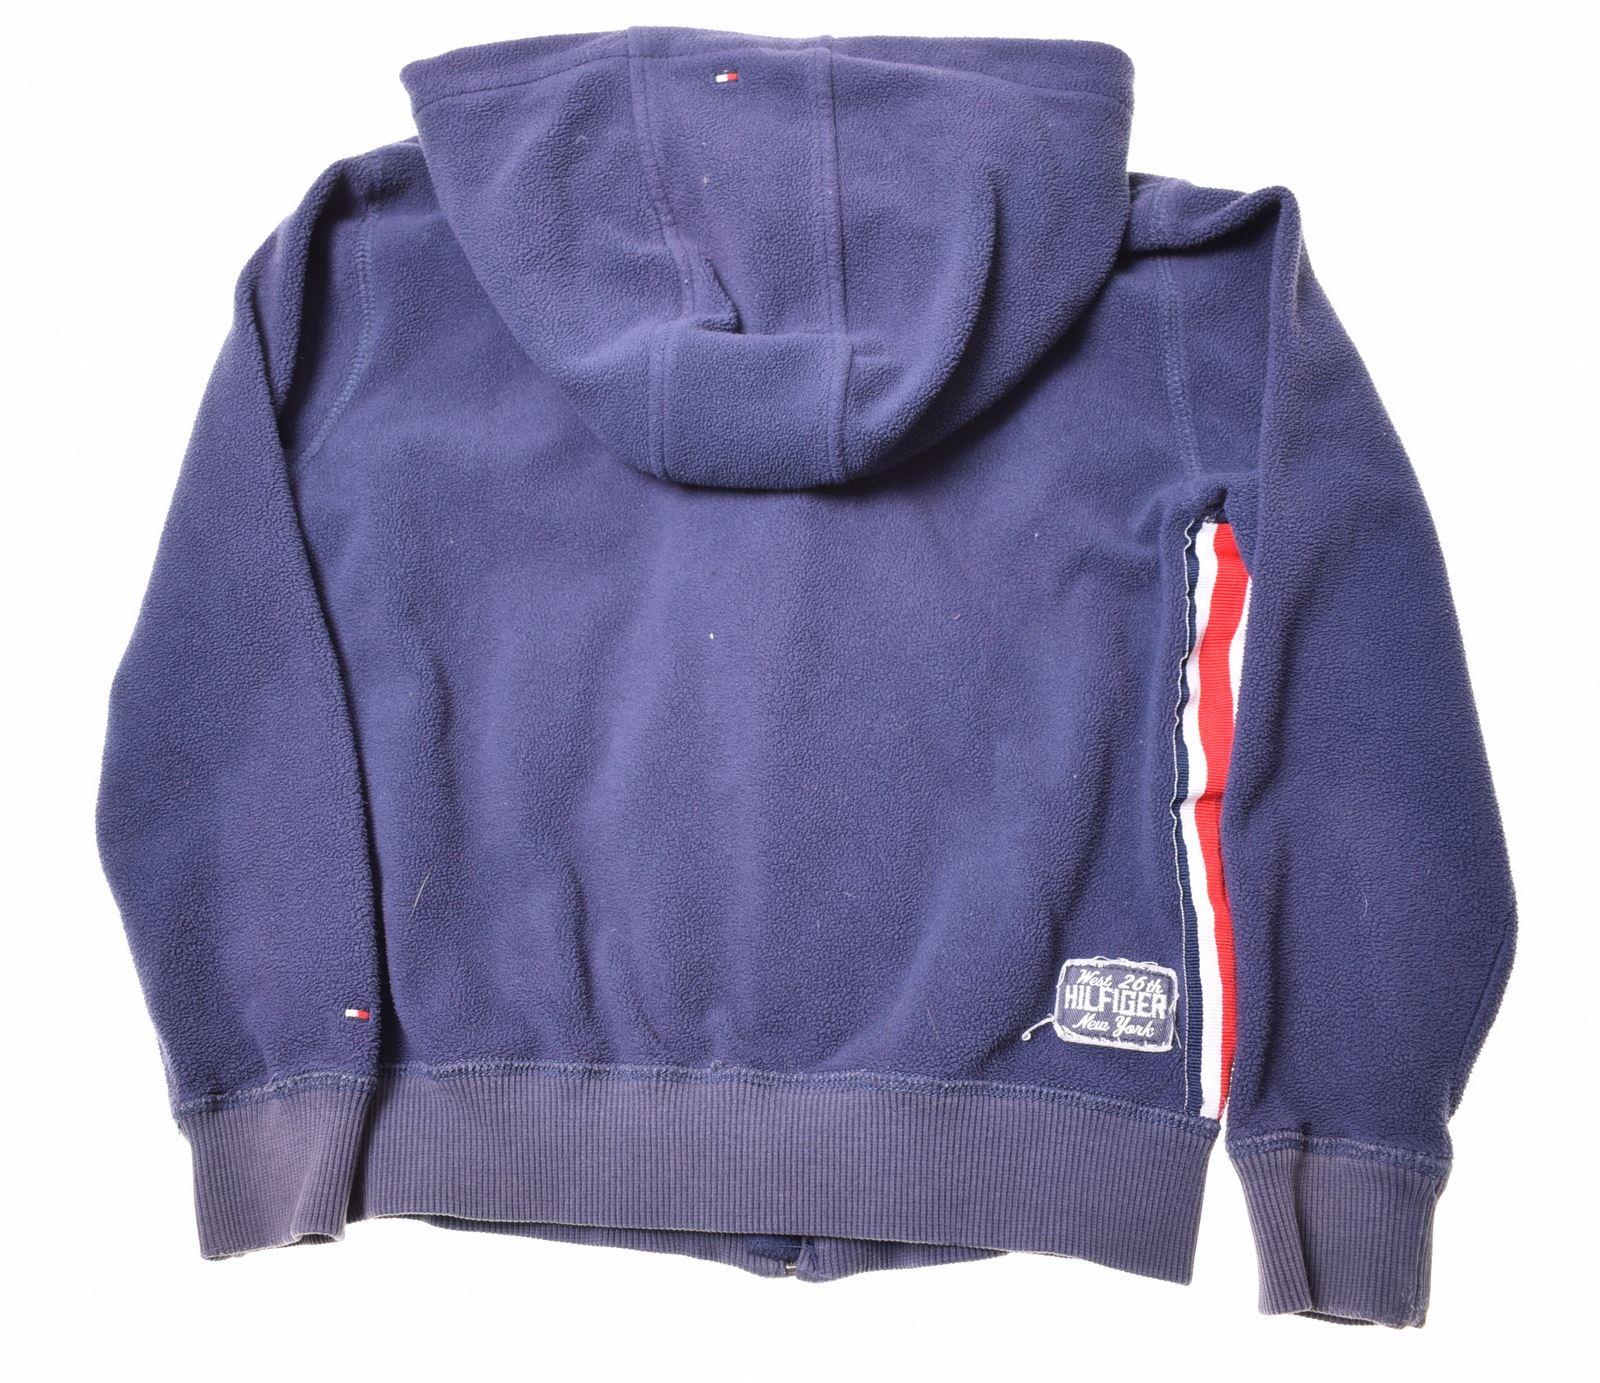 211e3d96 TOMMY HILFIGER Boys Fleece Hoodie Jacket 7-8 Years Blue Polyester   eBay